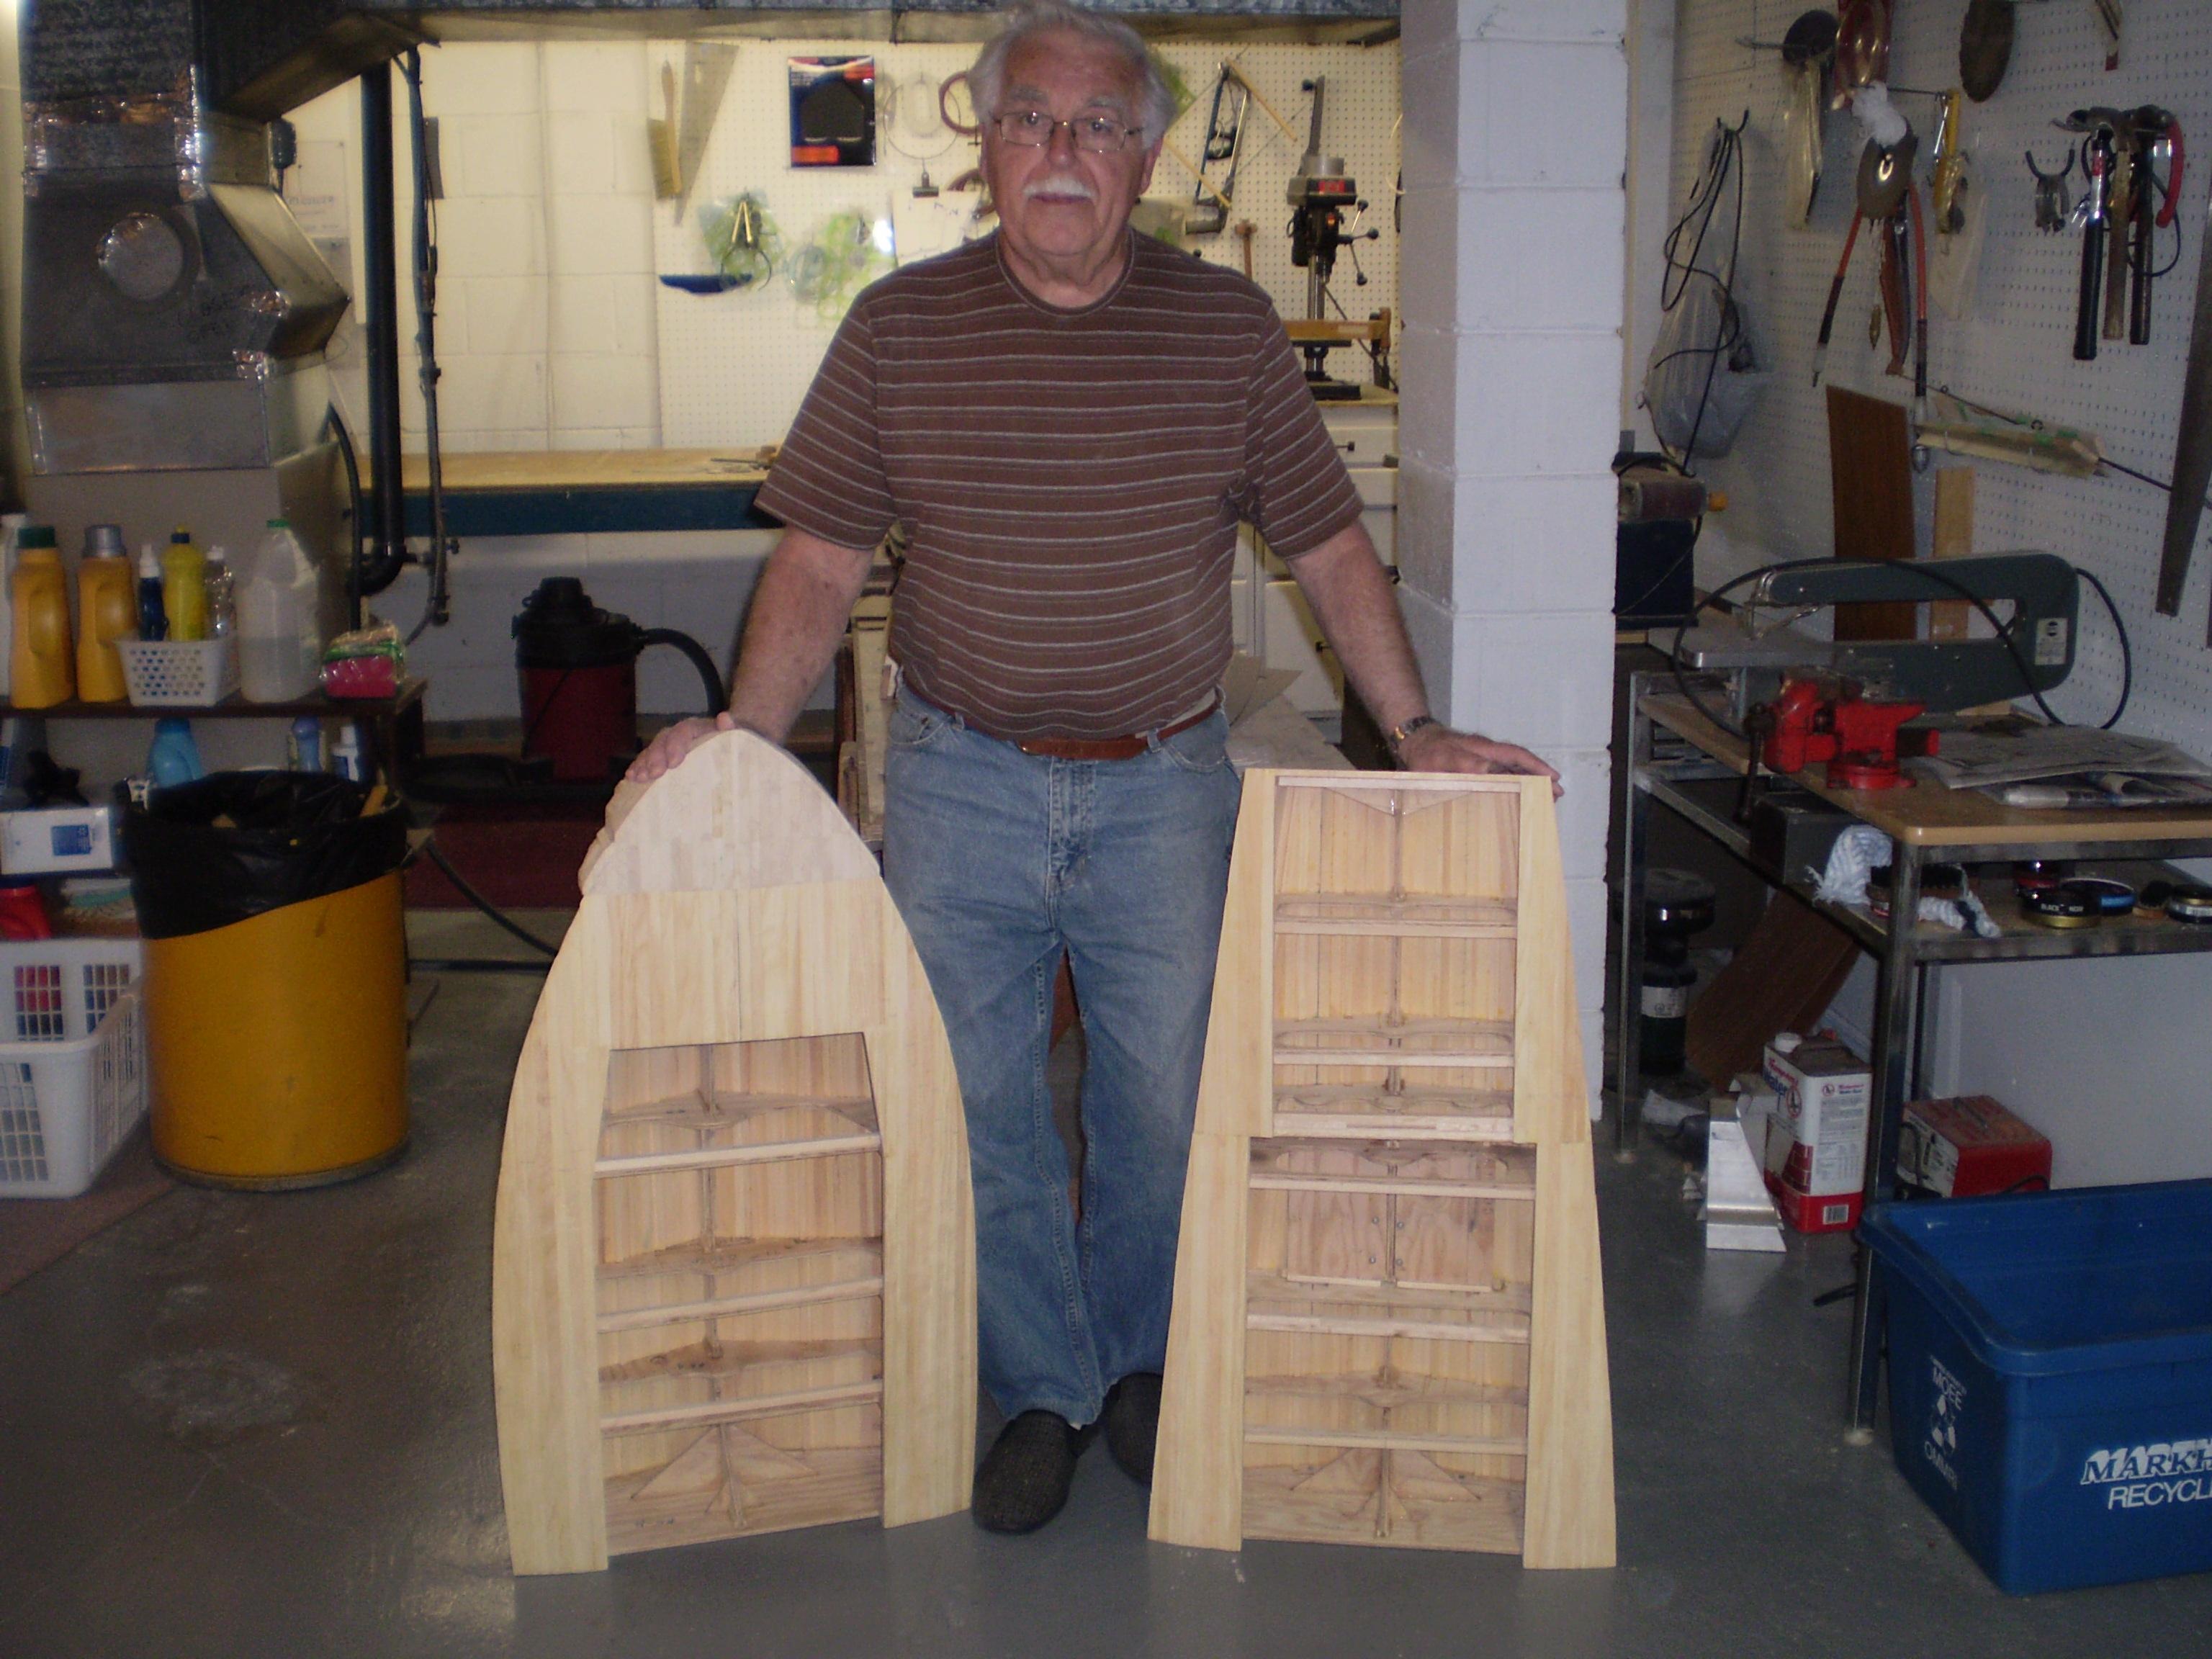 Diy Free Model Row Boat Plans Wooden Pdf Tool Storage